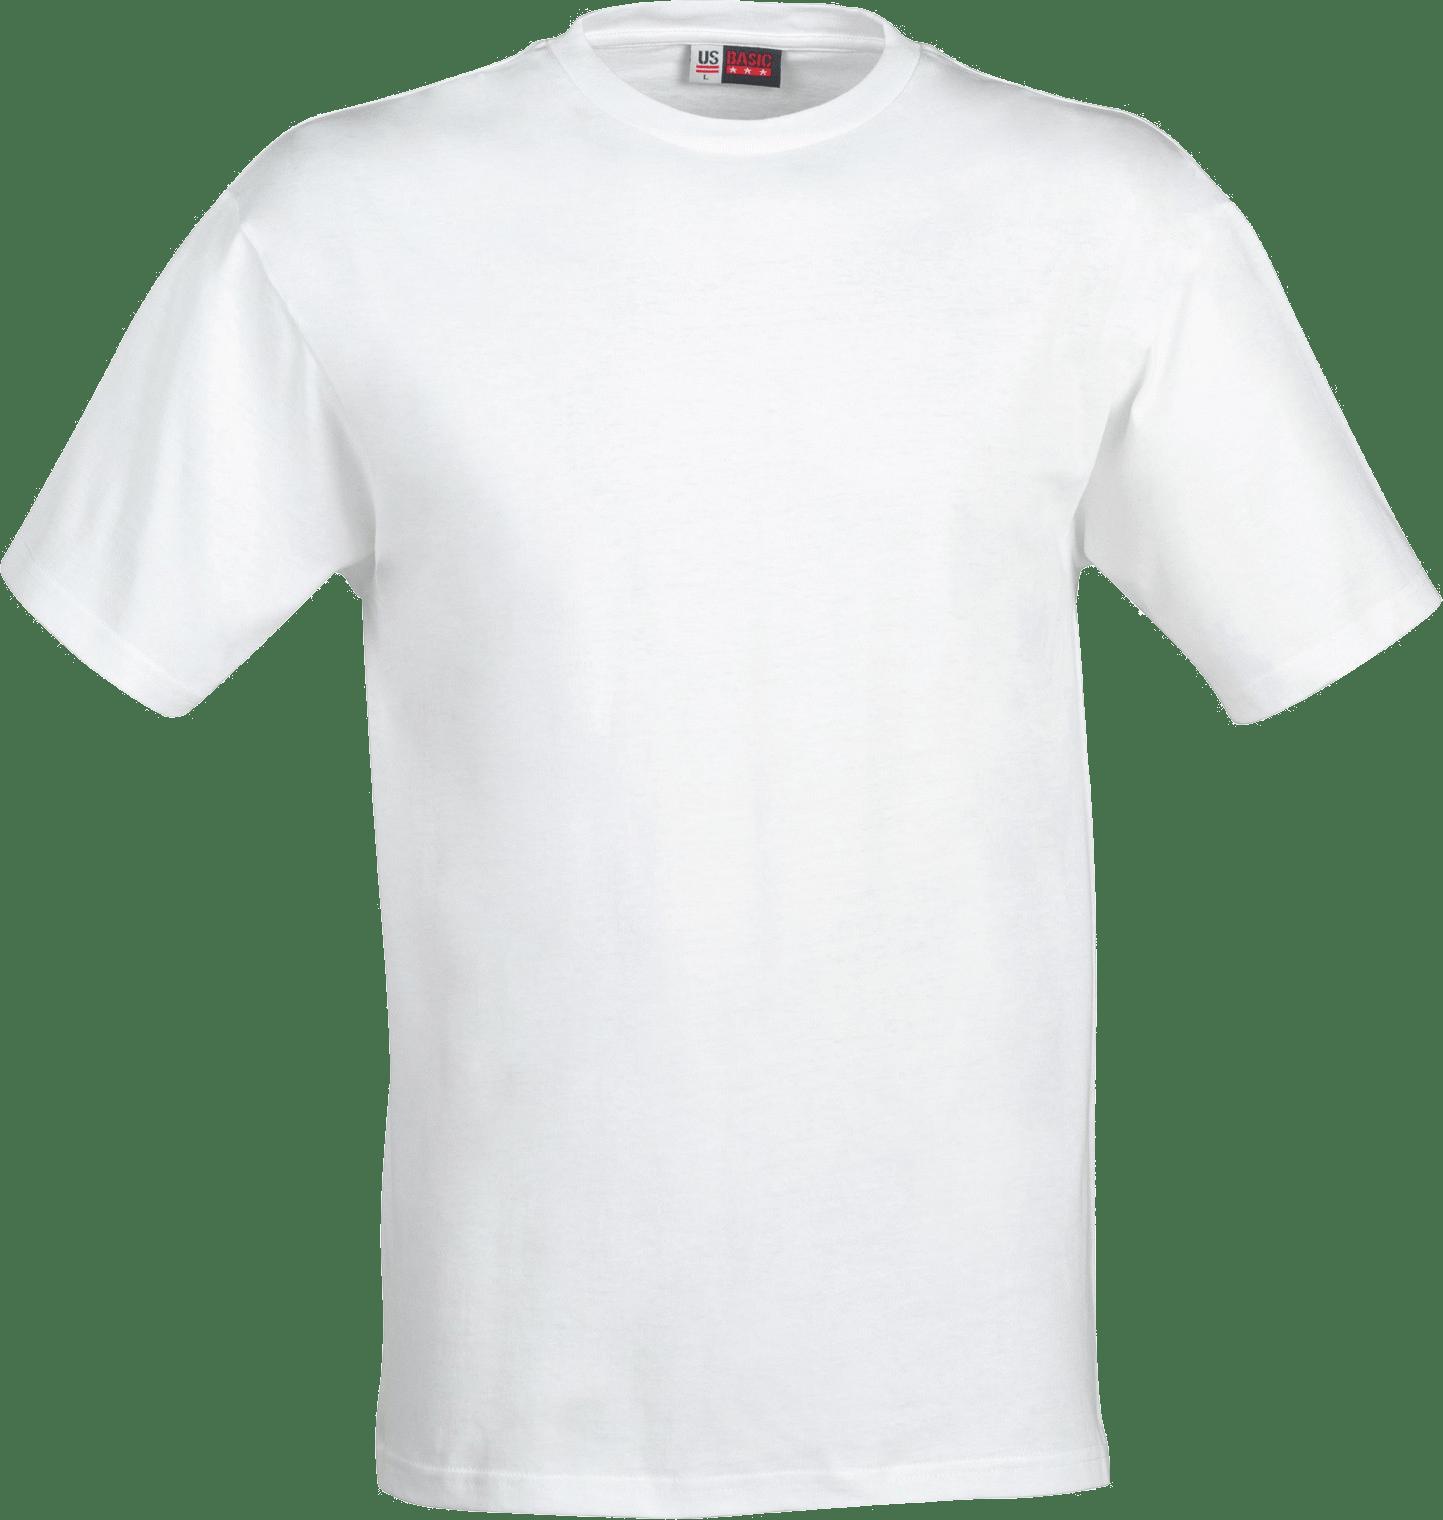 White t shirt png image